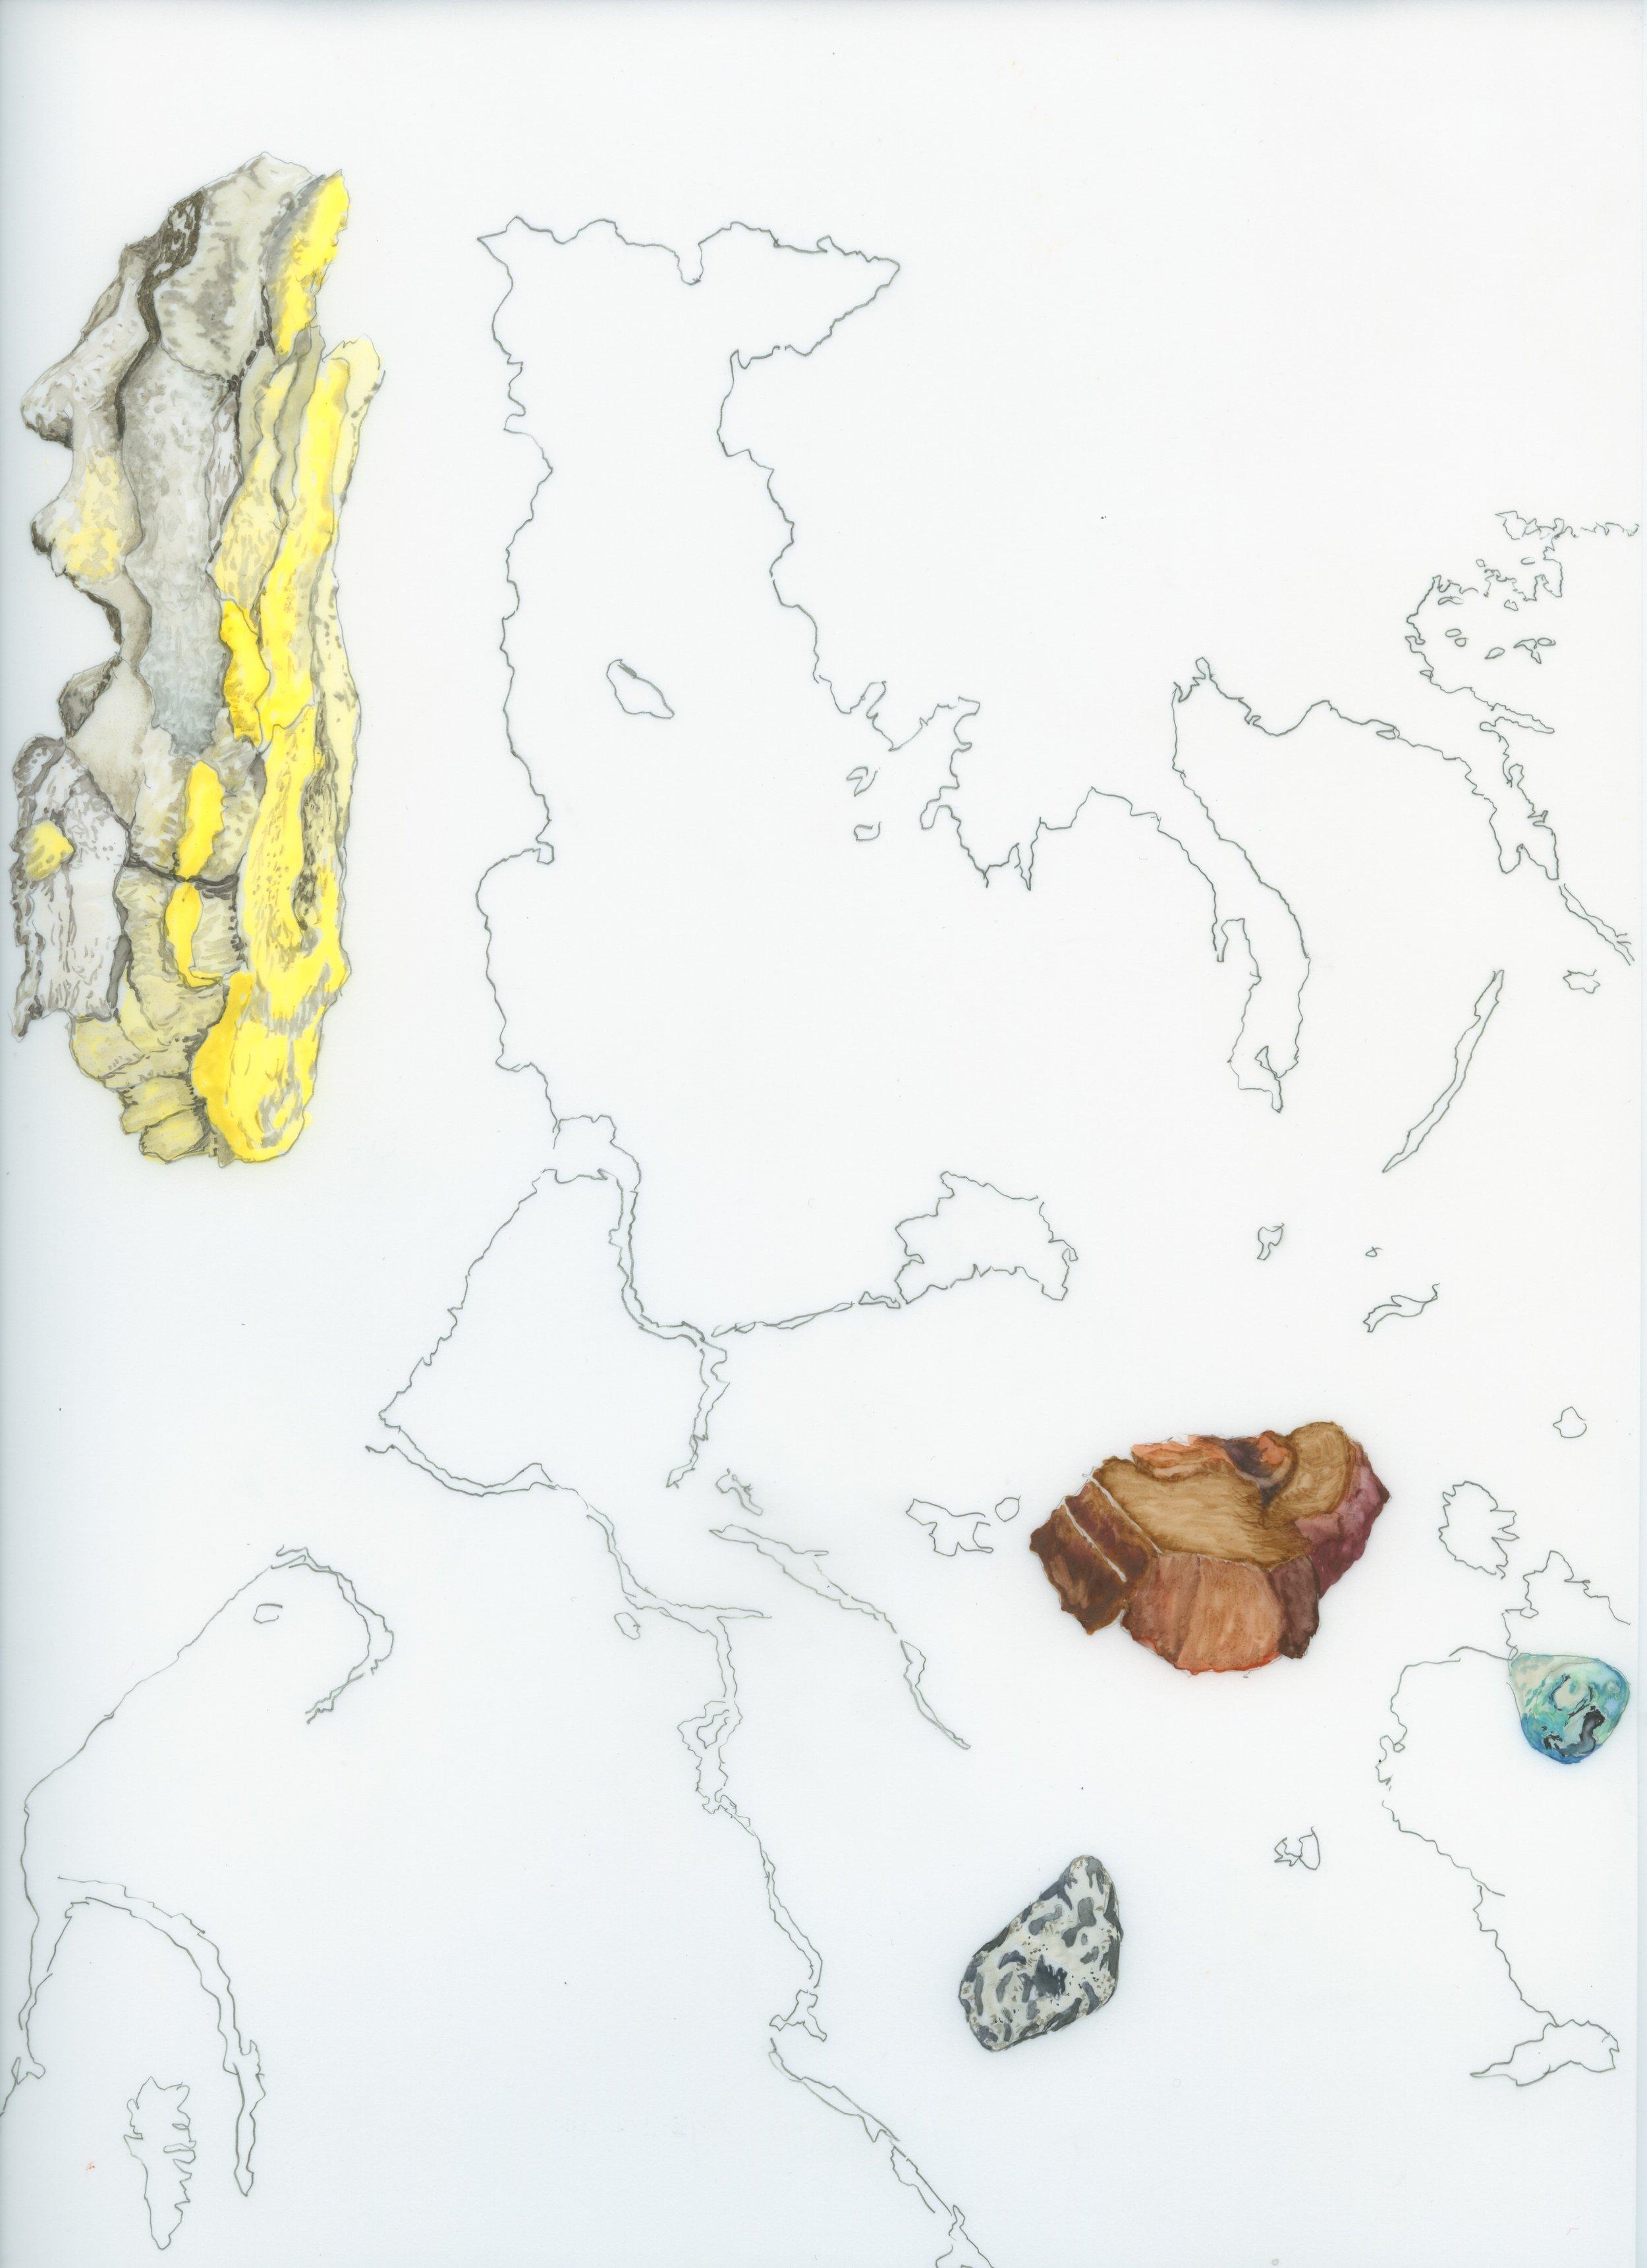 Map Tracings 8